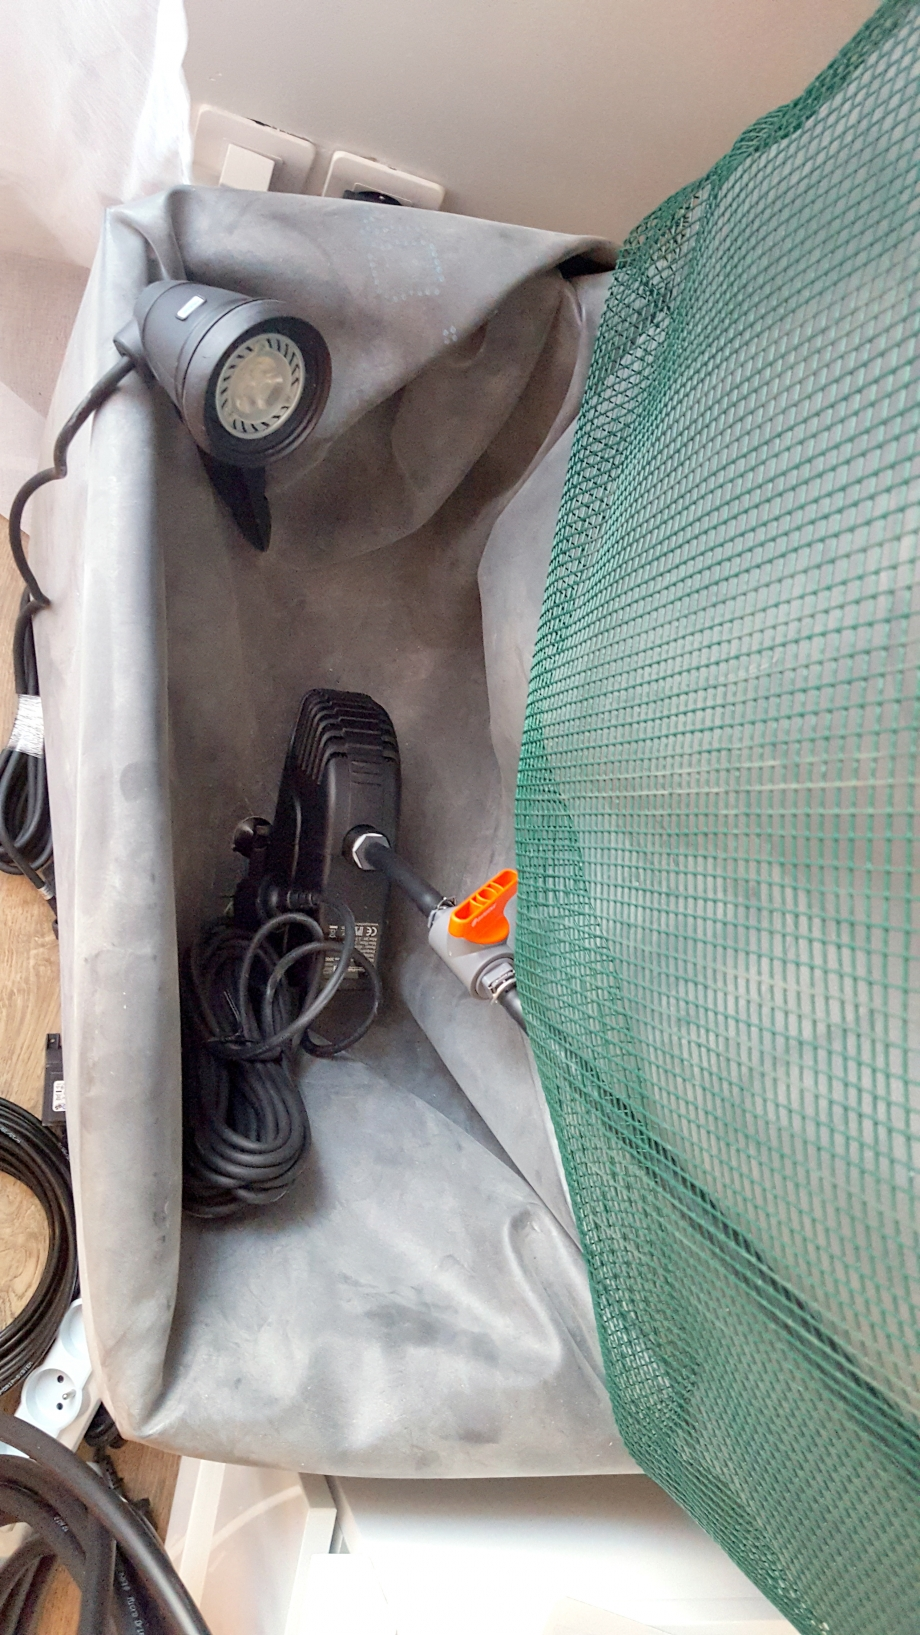 préparation pompe et spot mur 18 fev 17.jpg